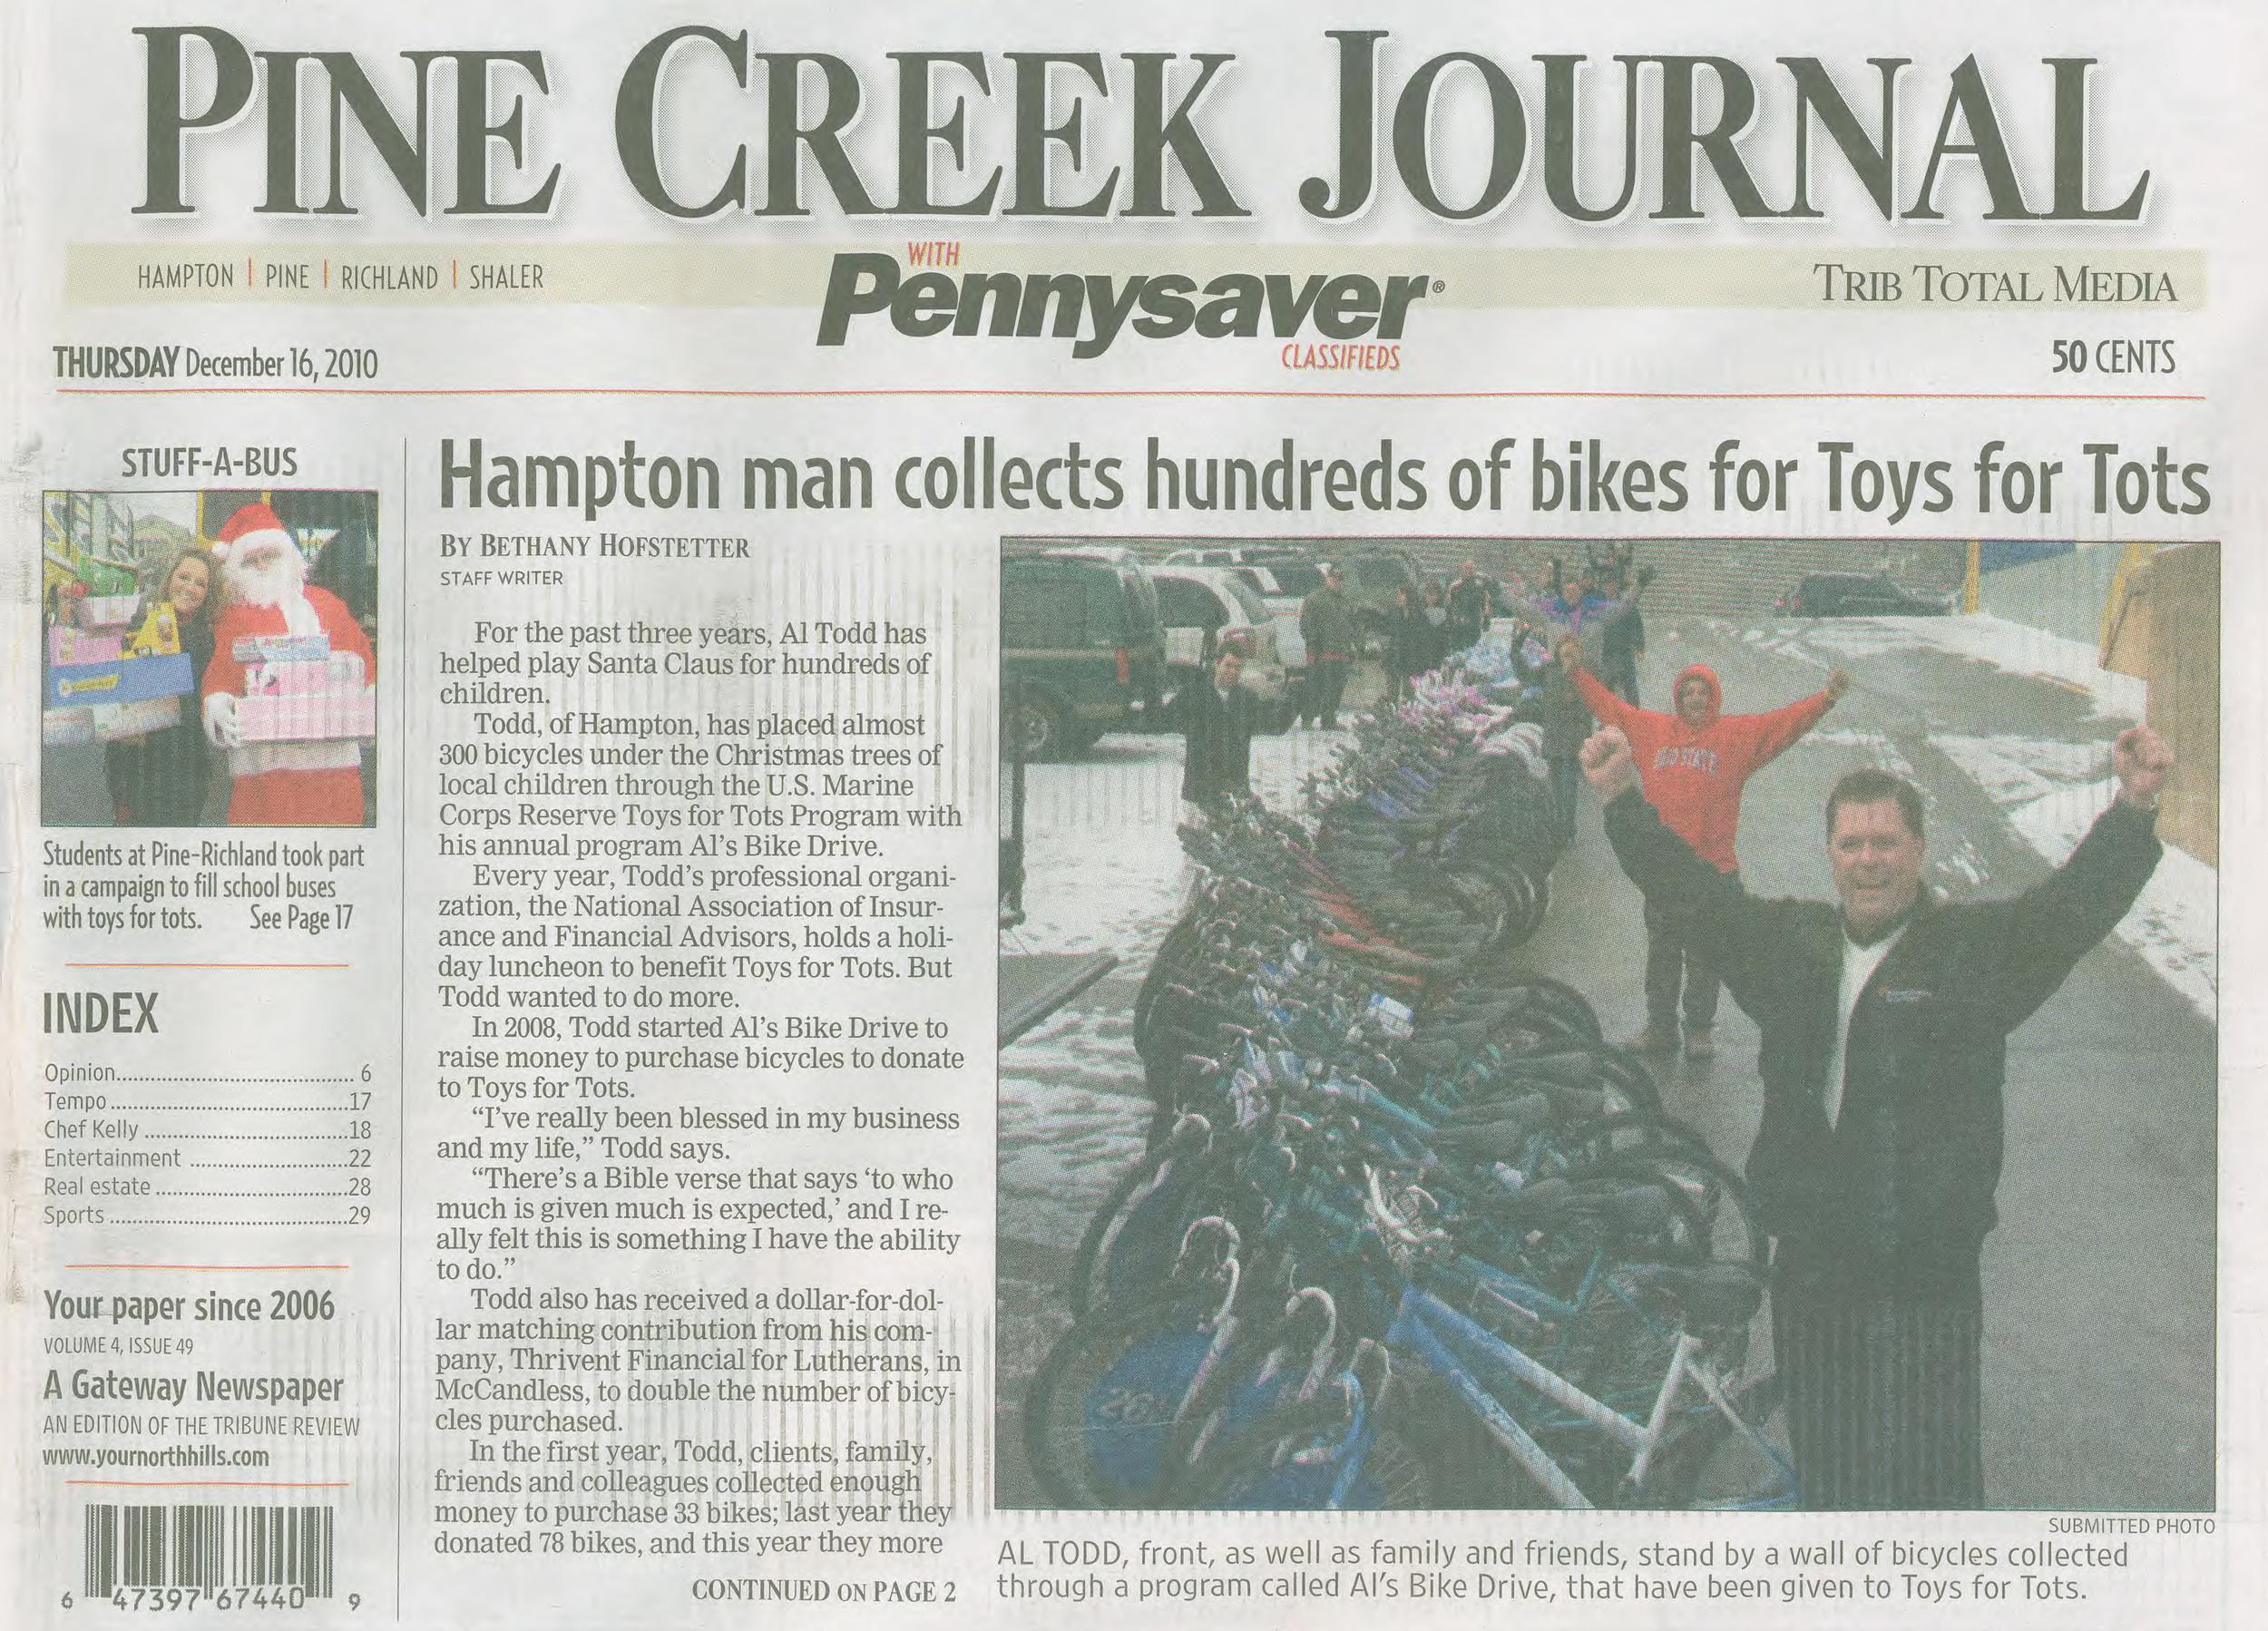 20101216 - pine creek journal article-1.jpg